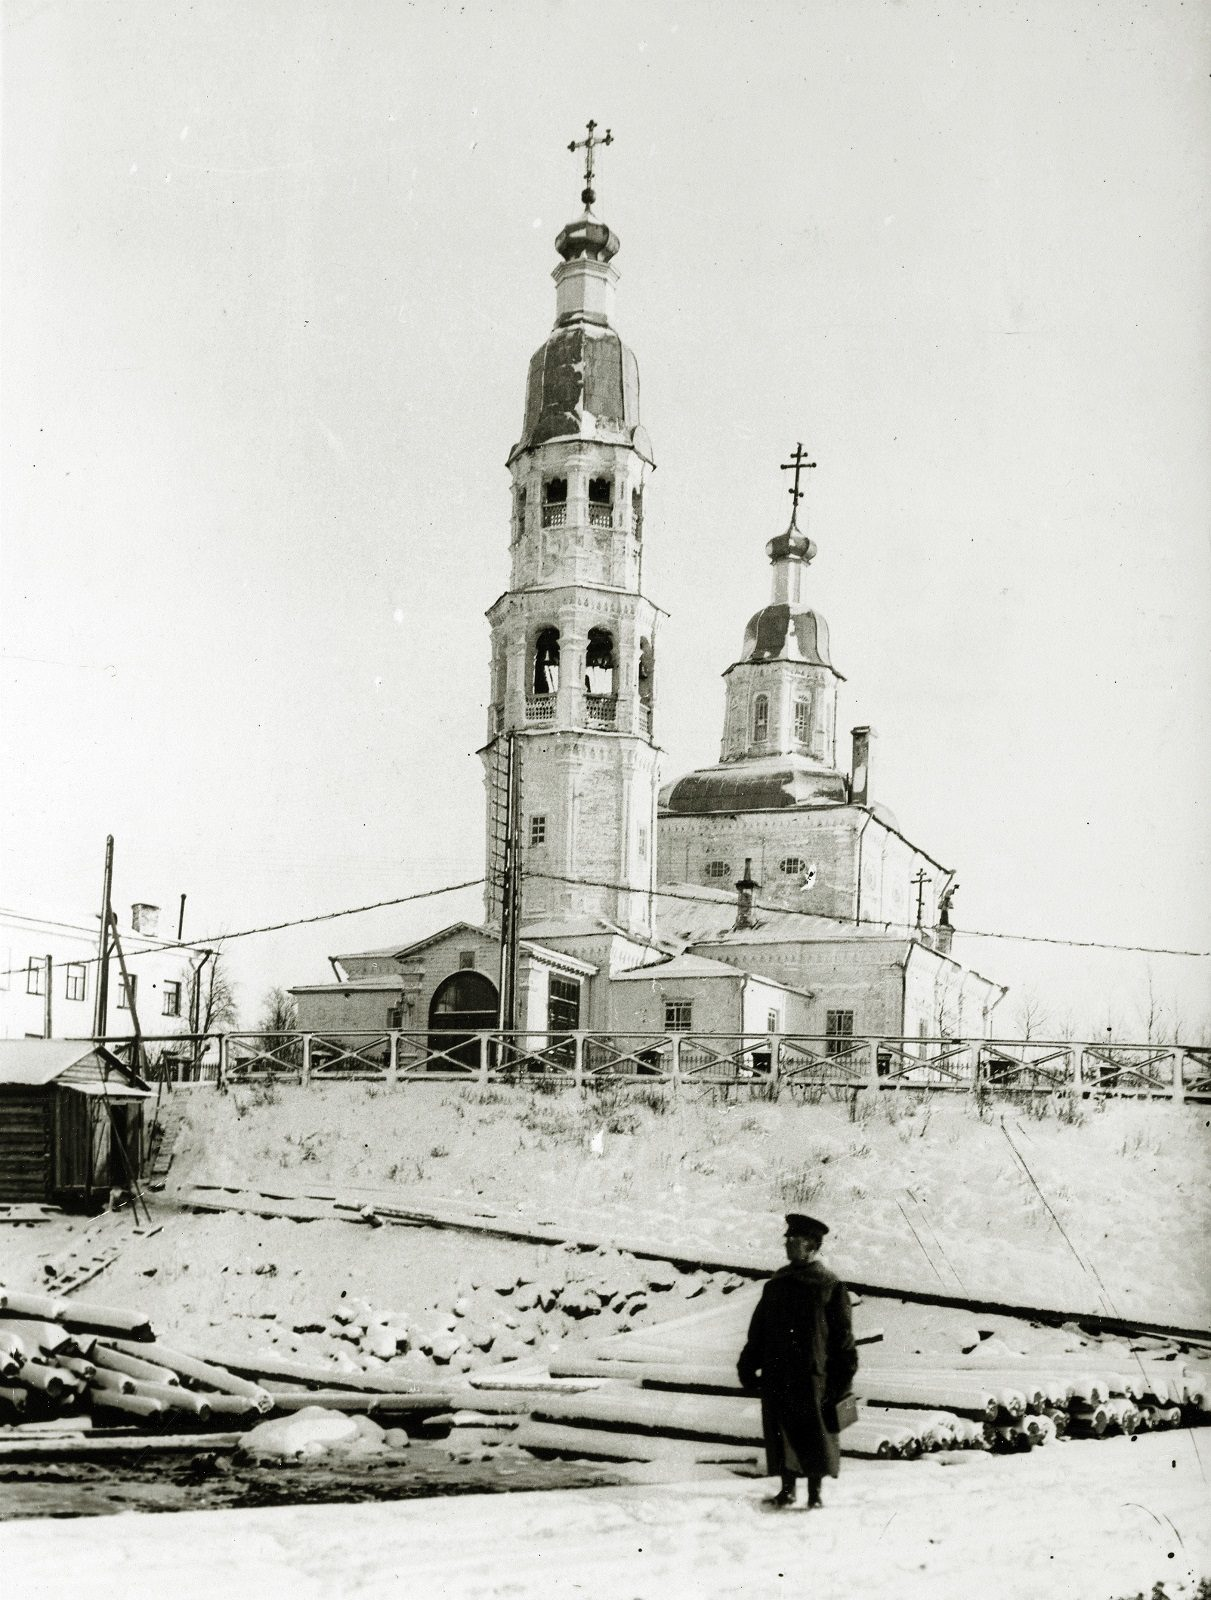 Foreign soldier. Arkhangelsk during revolution and civil war 1918-1919